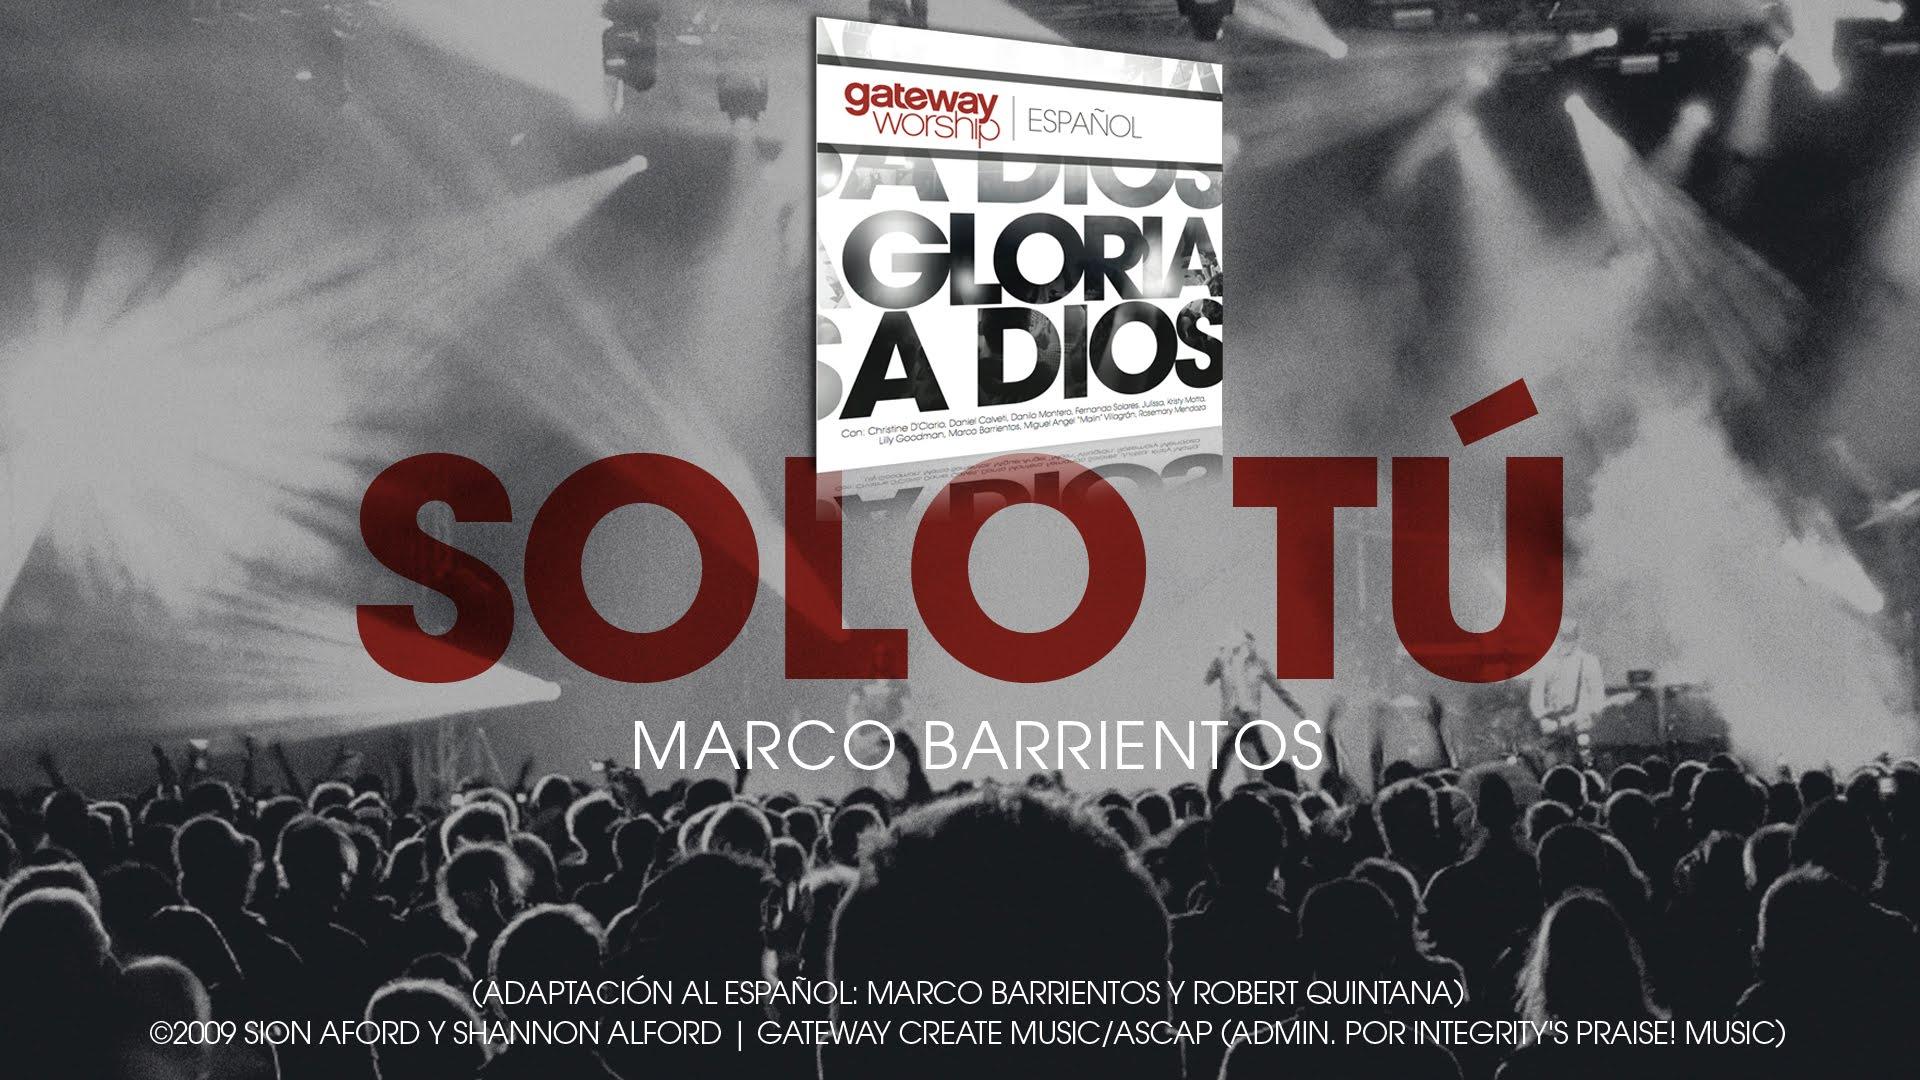 Photo of Marco Barrientos & Gateway Worship – Solo tu